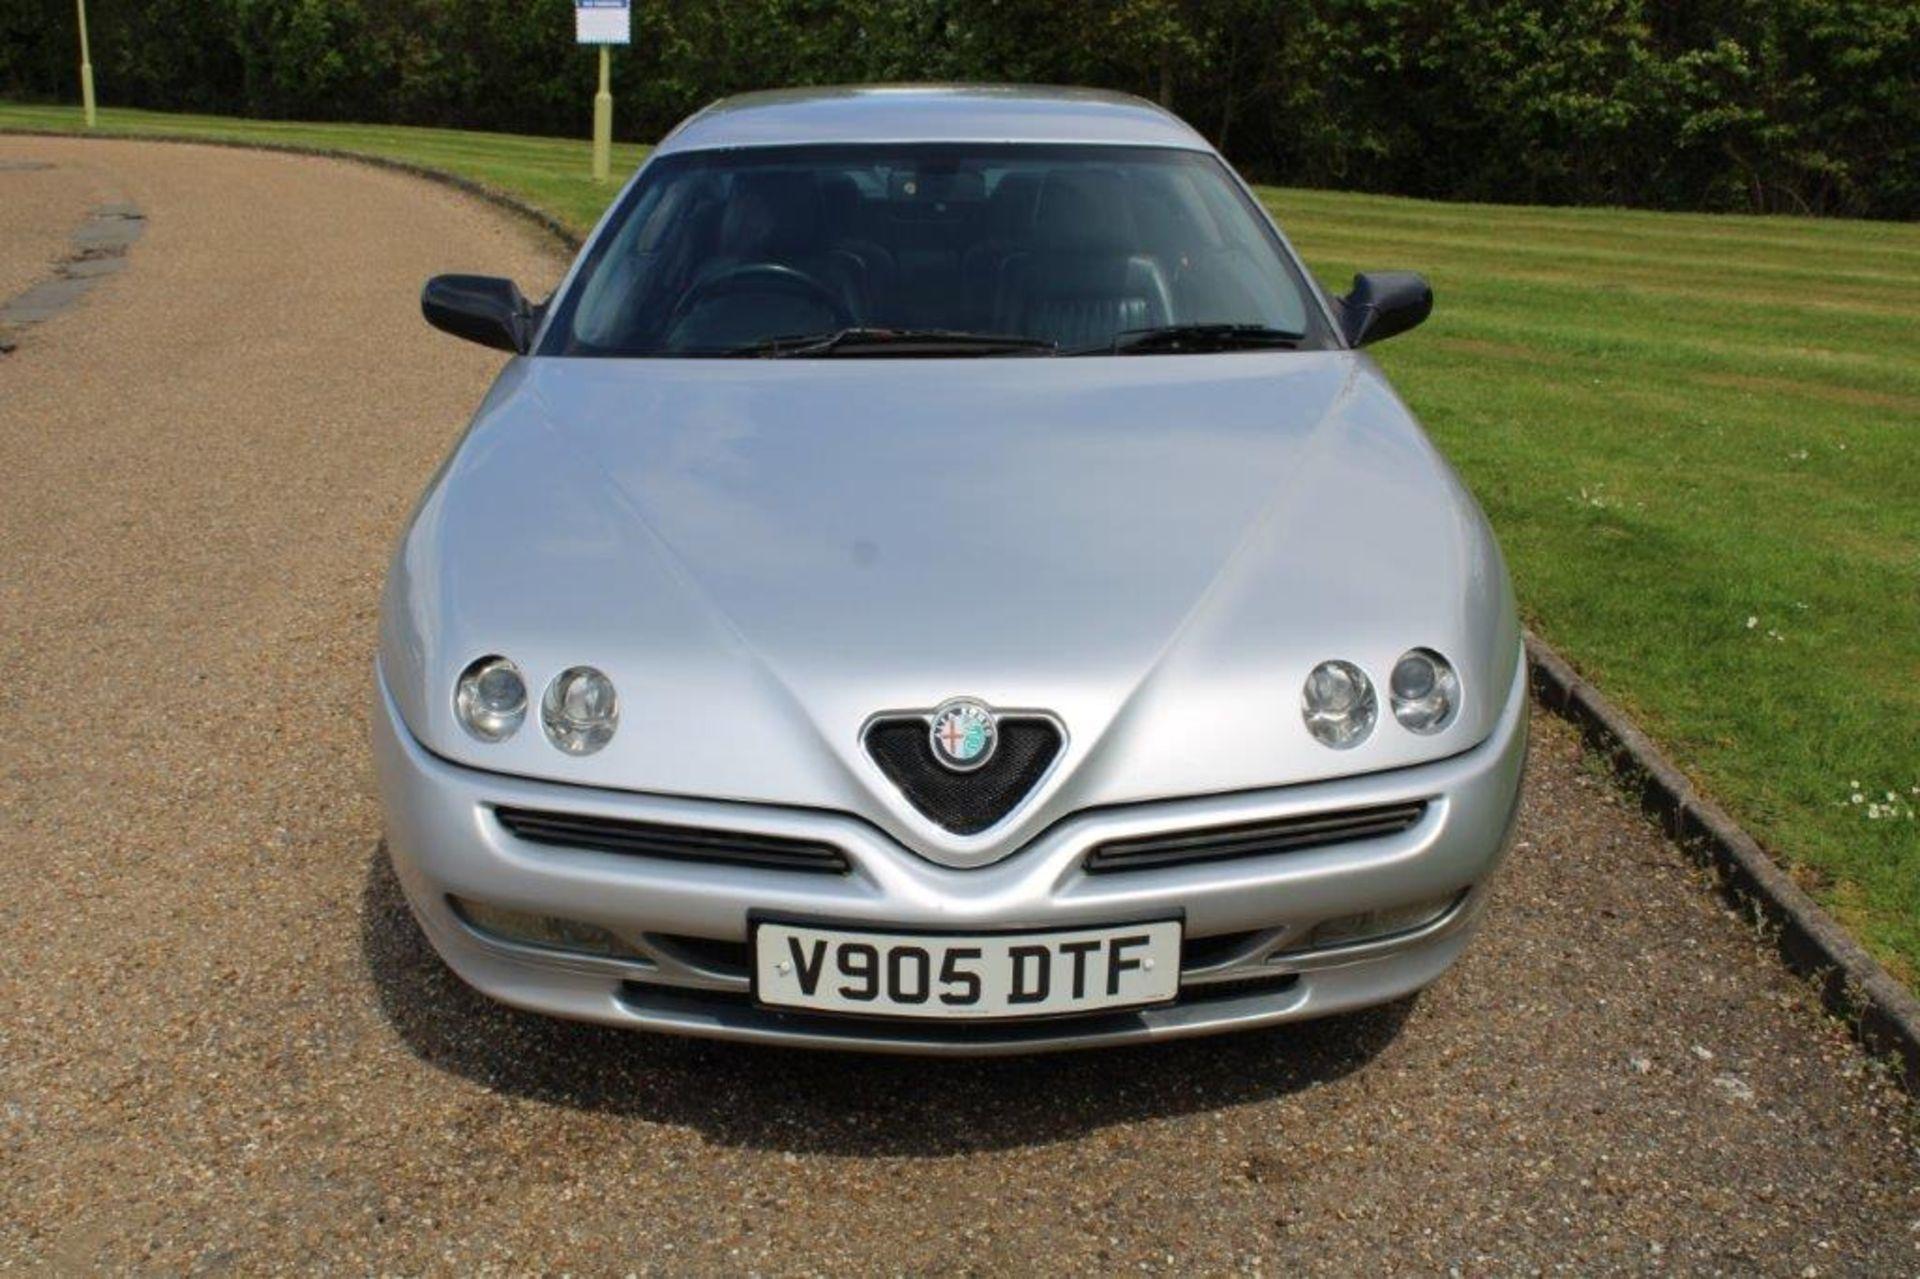 1999 Alfa Romeo GTV Lusso T-Spark 16v - Image 10 of 18